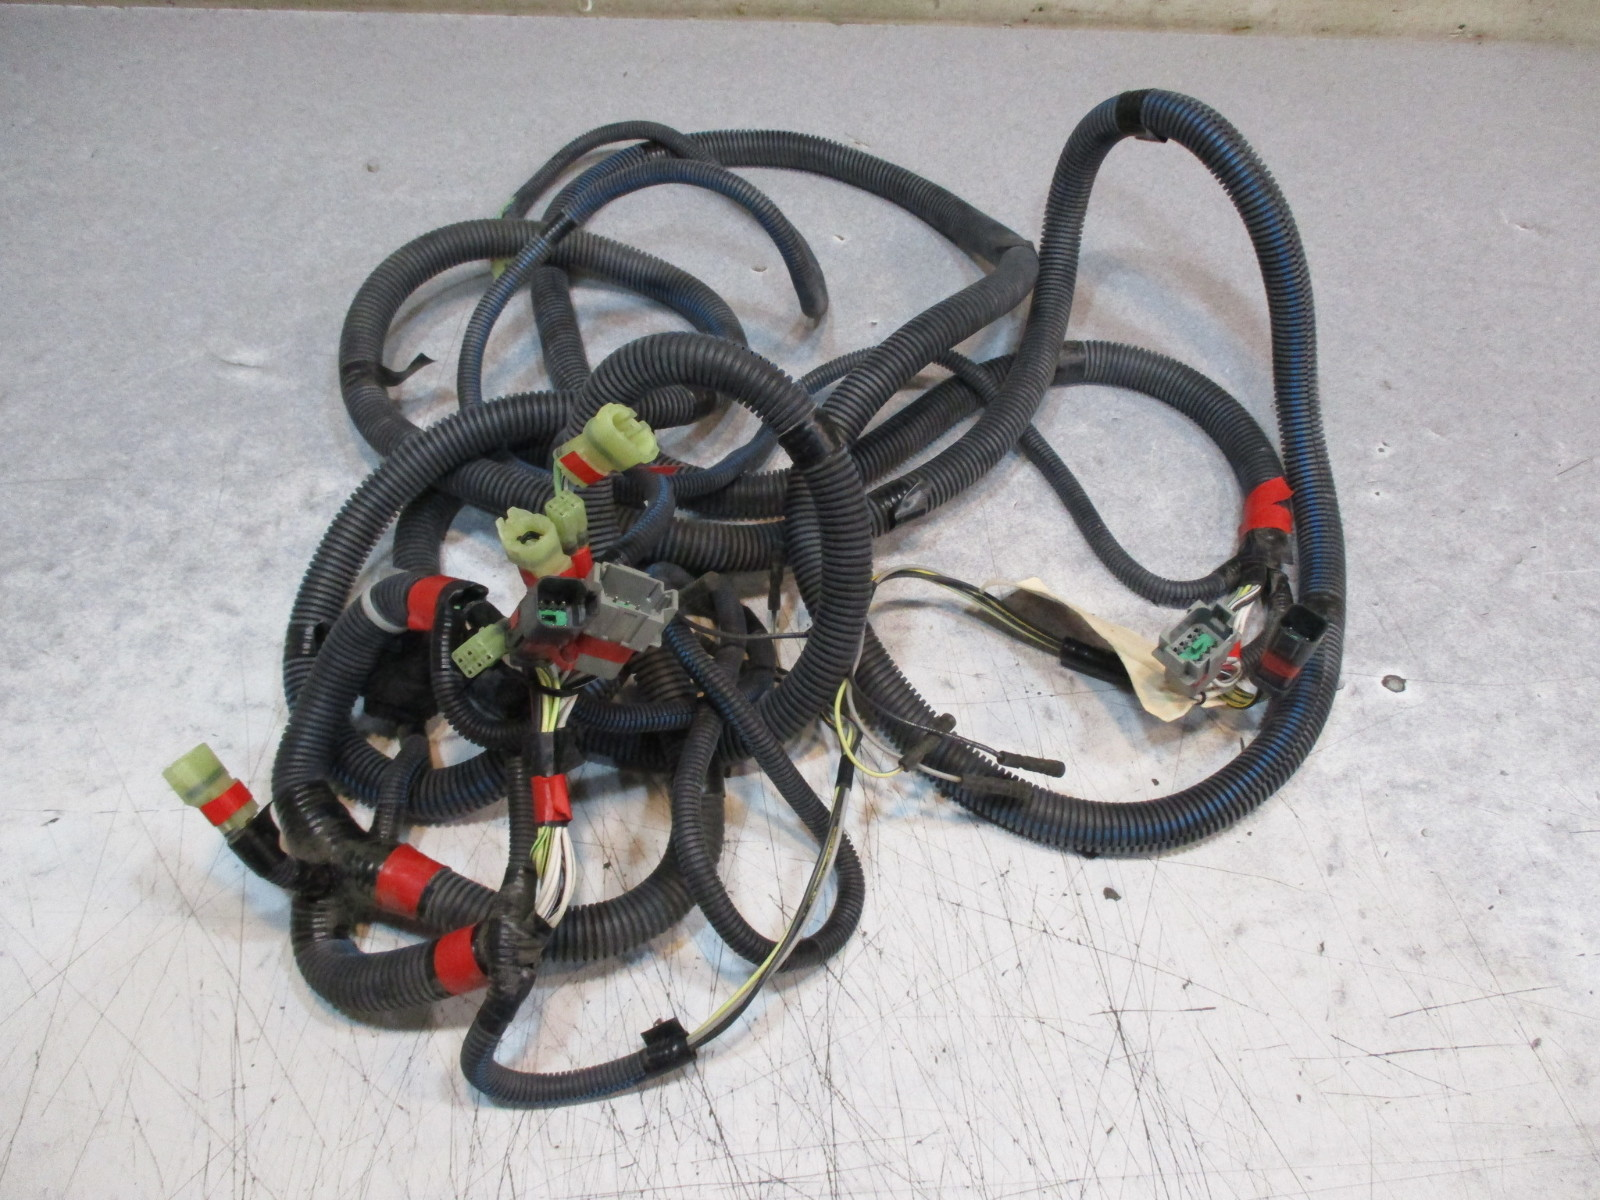 Zw ah honda marine boat engine to dash wire